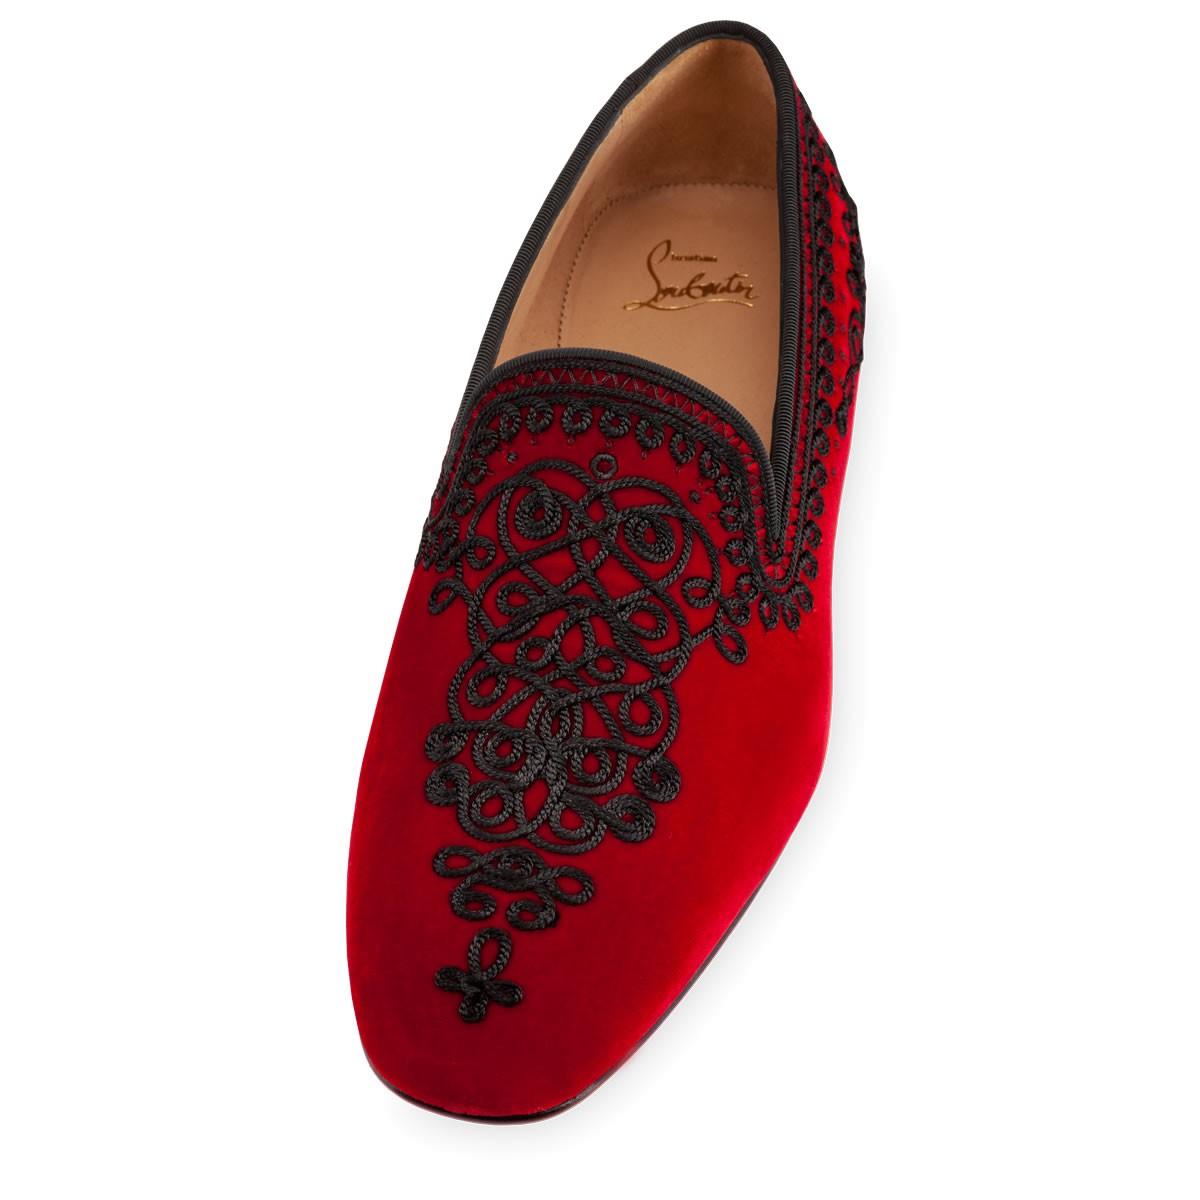 christian louboutin mens shoes - Christian Louboutin Launches Men\u0026#39;s Boutique in Dubai\u0026#39;s Mall of the ...